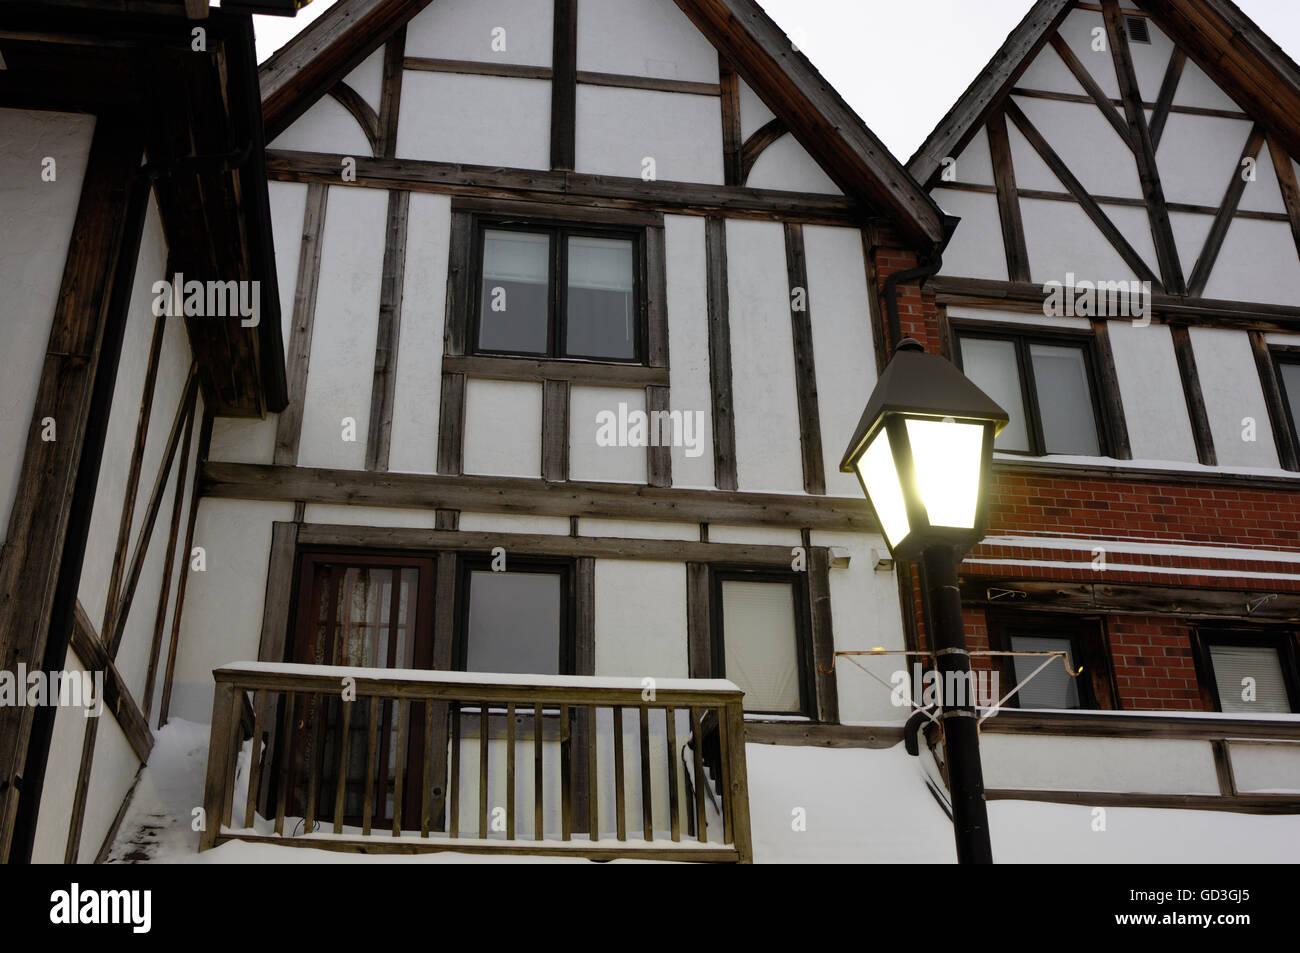 Houses in Tudor style, Pickering Village, Ajax, Ontario, Canada - Stock Image